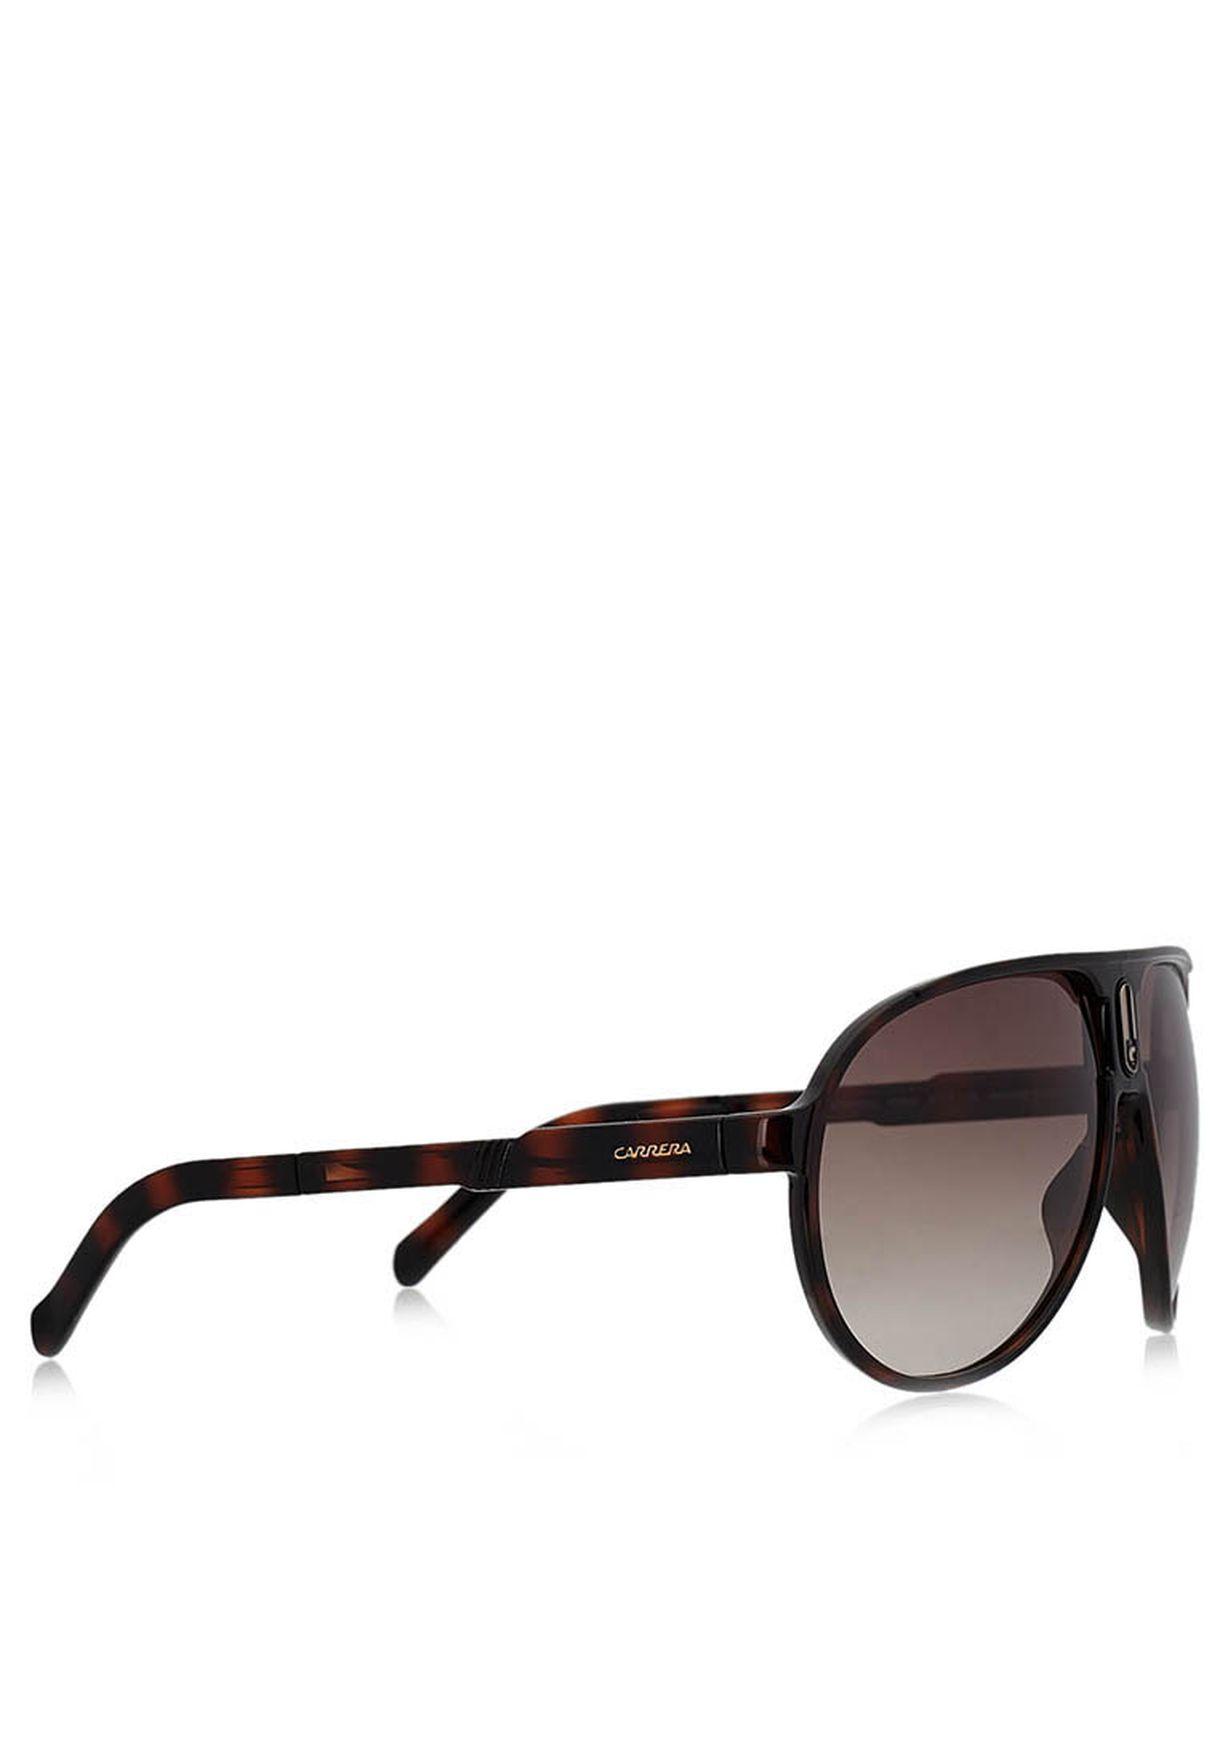 afc4afe8d تسوق نظارة شمسية كاريرا Champion قابلة للطي ماركة كاريرا لون بني في ...